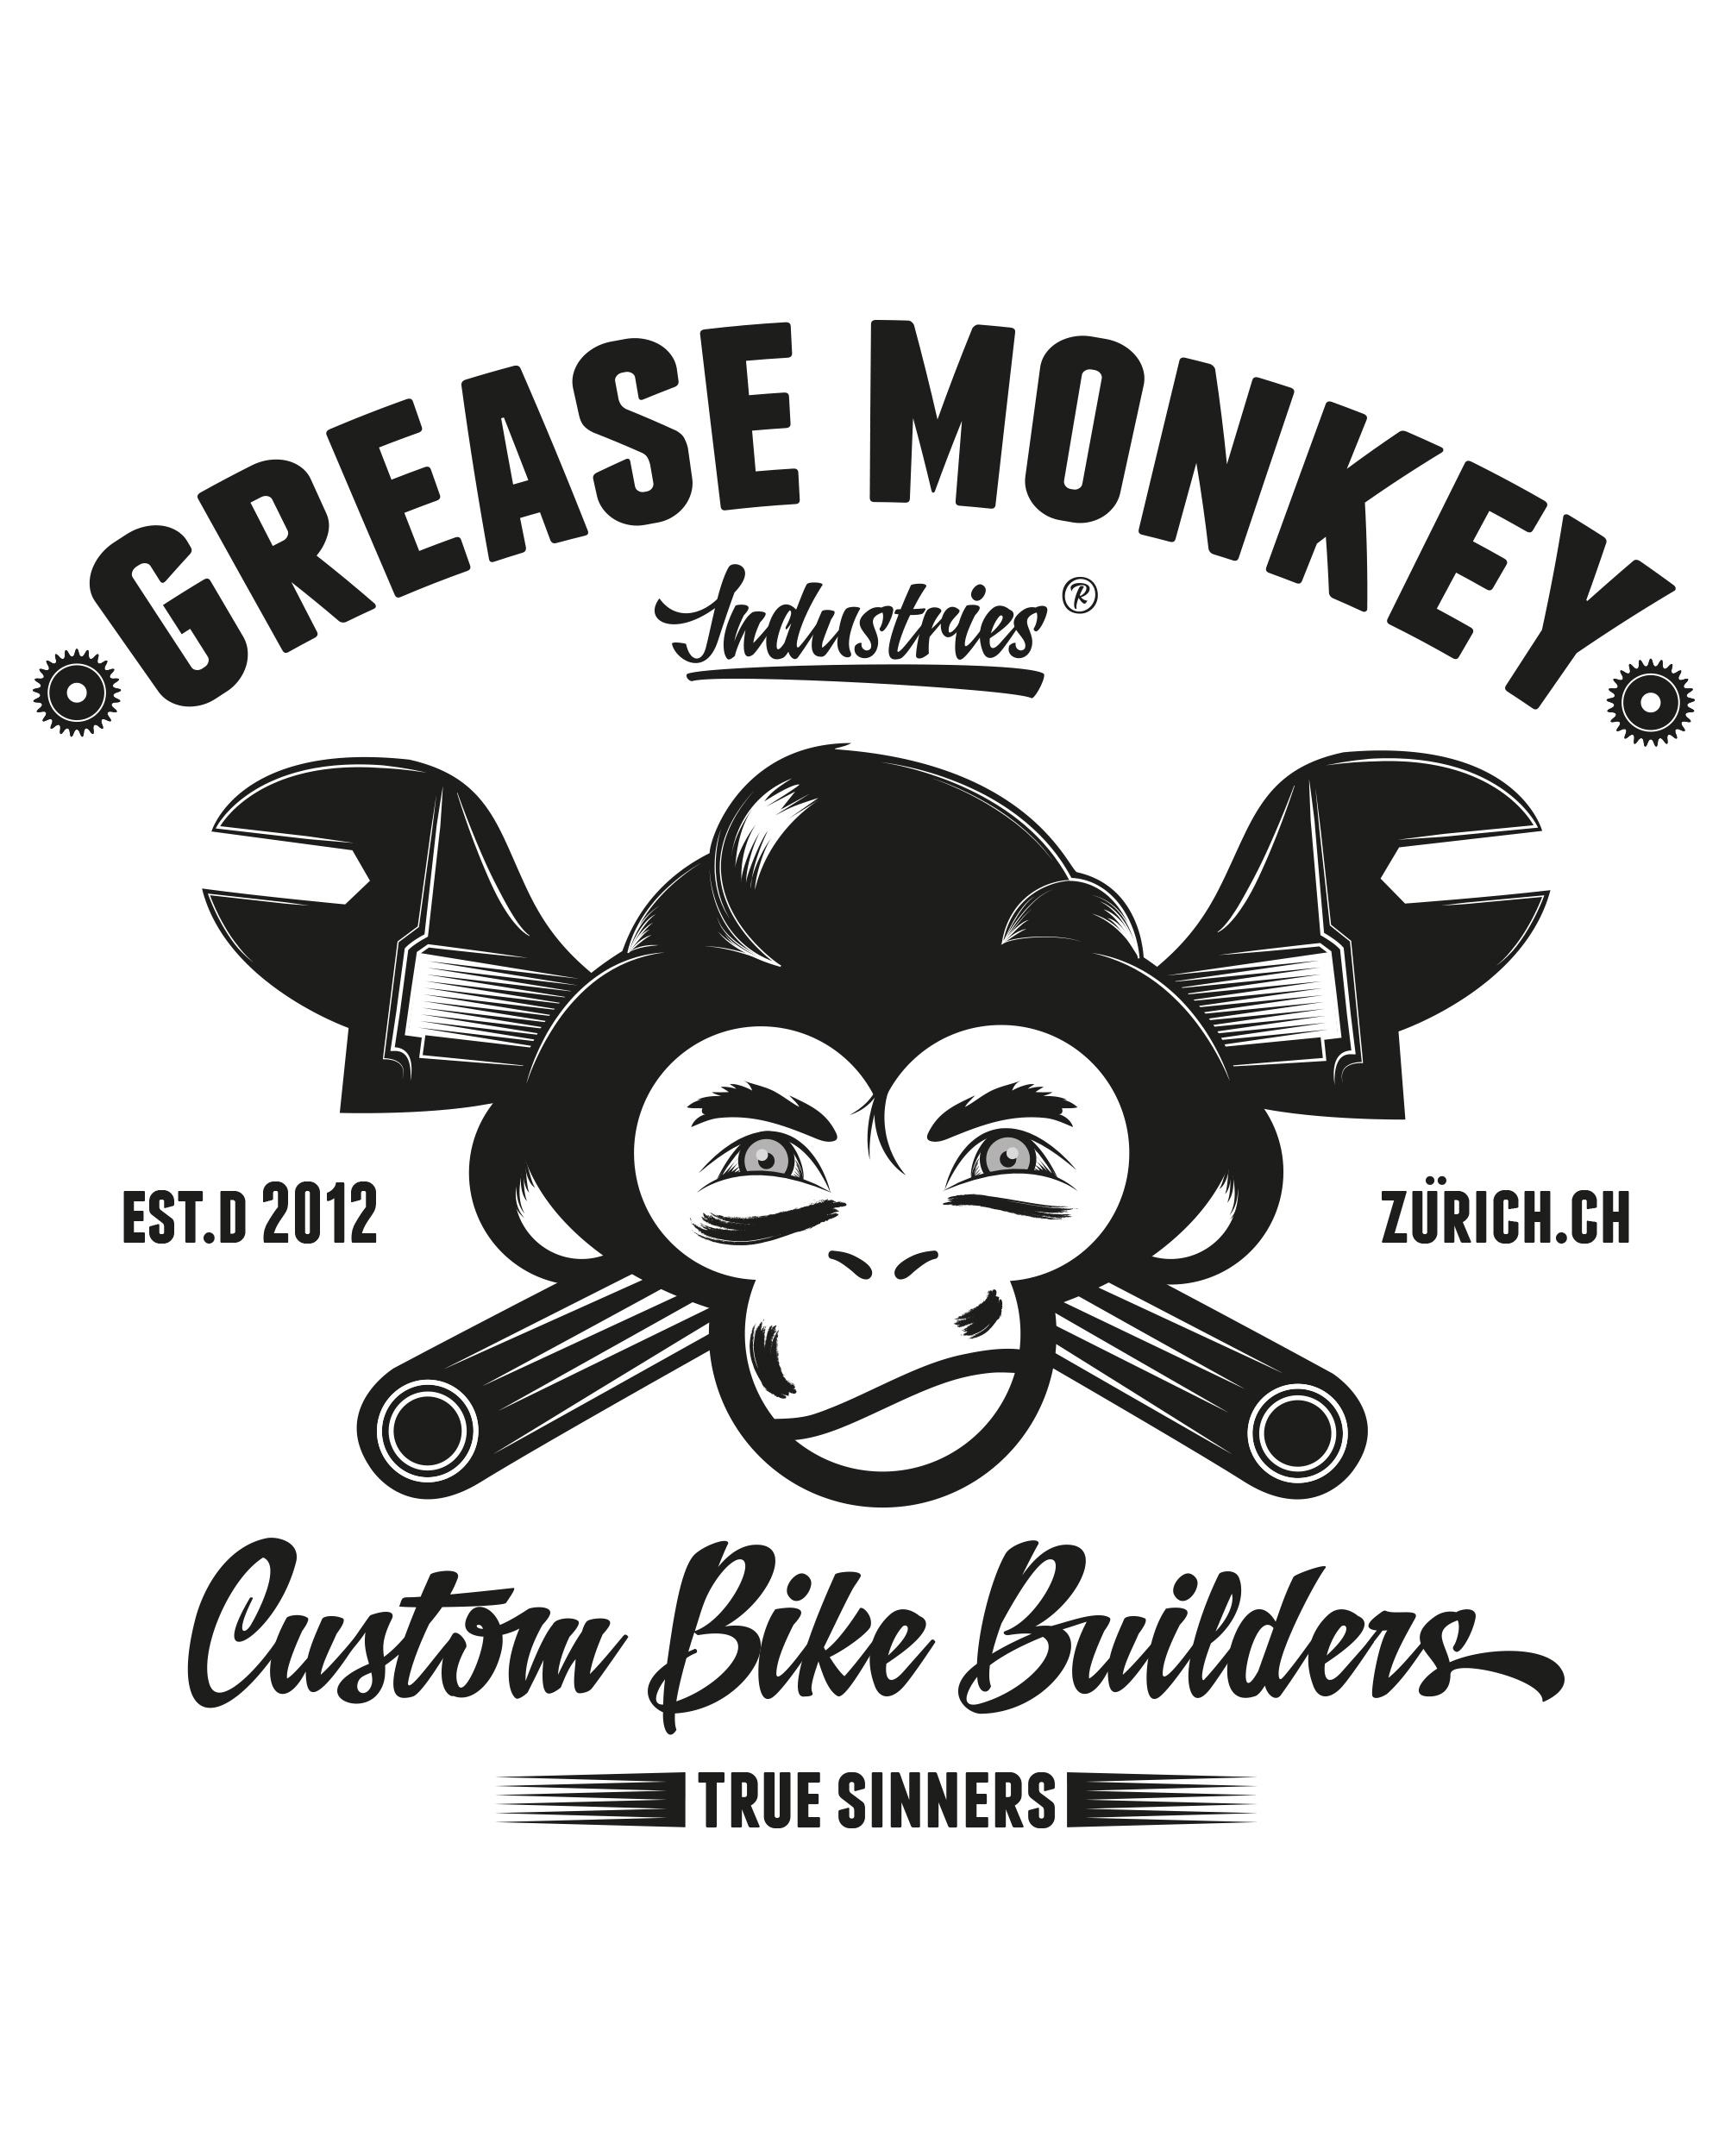 2000x2500 Swiss Grease Monkey. Logo Vector Artwork For Swiss Cafe Racer